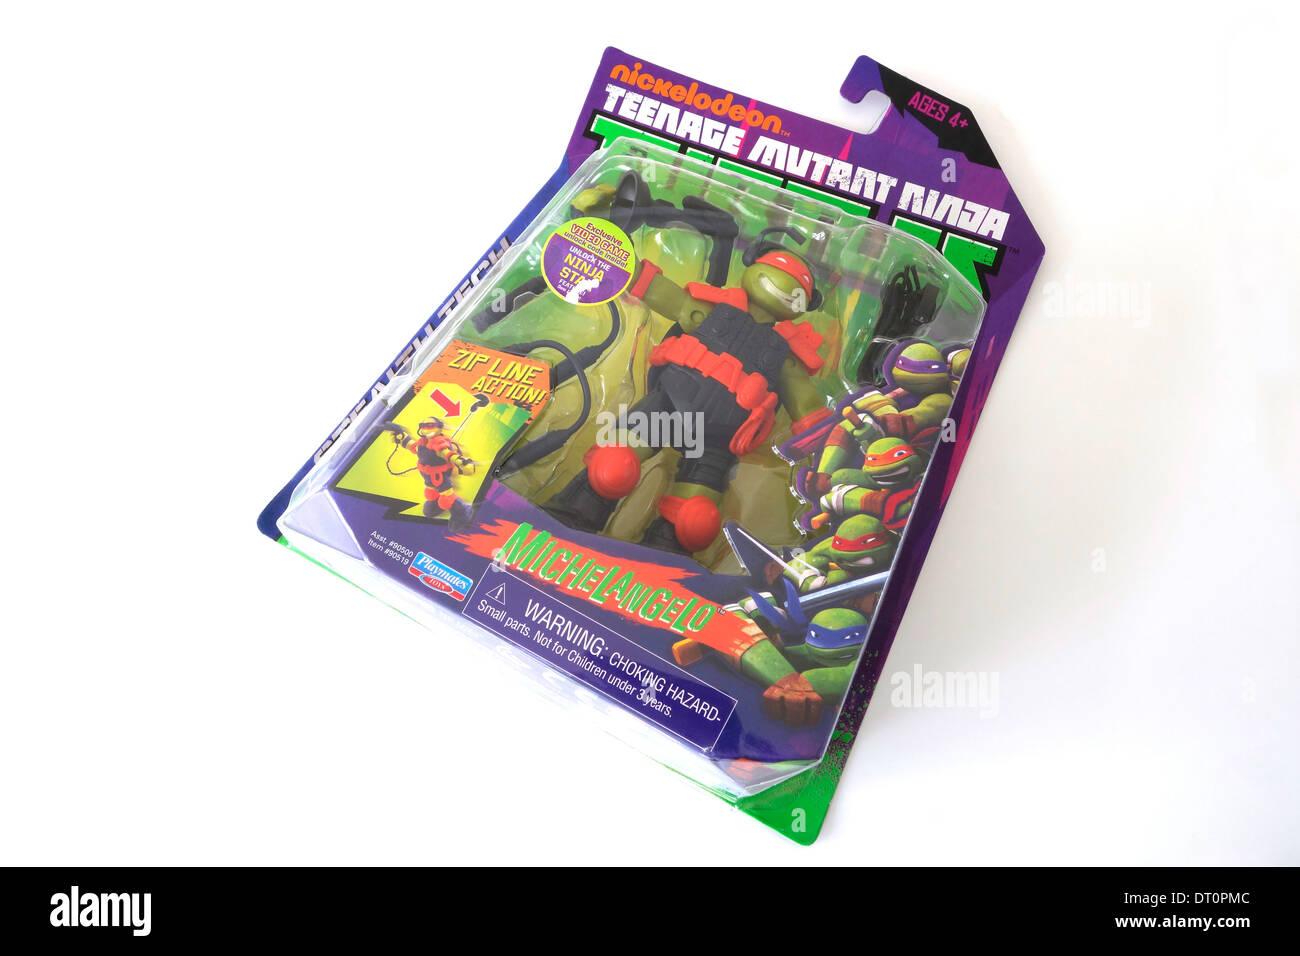 Nickelodeon Teenage Mutant Ninja Turtles Michelangelo Toy Action Figure - Stock Image